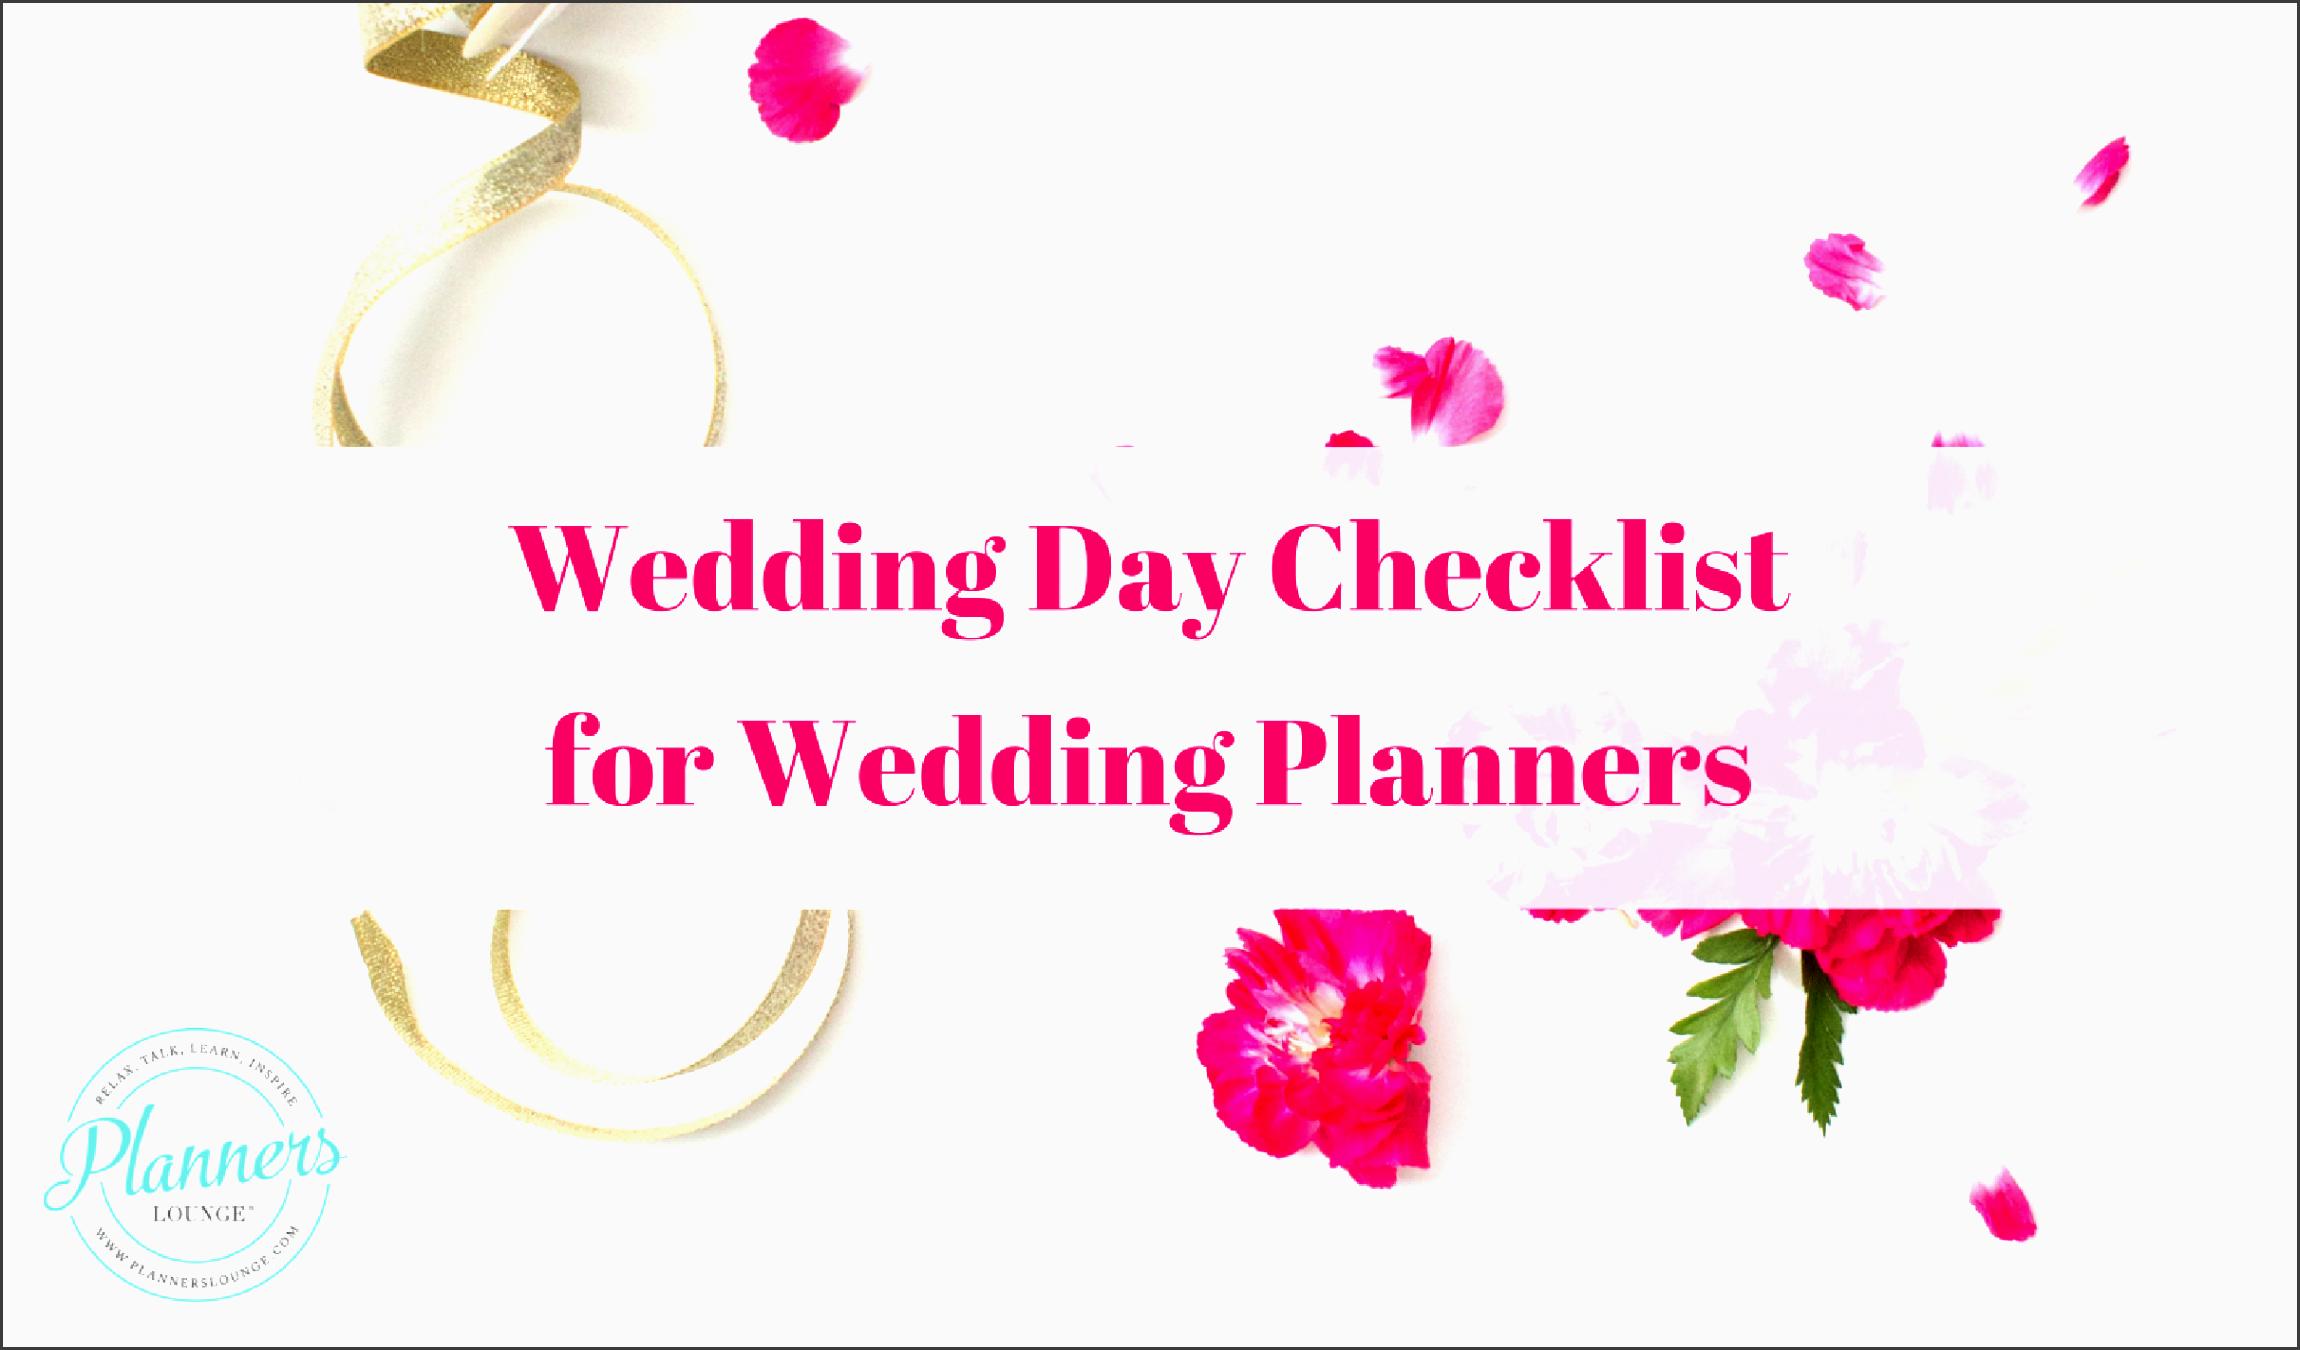 checklist wedding day